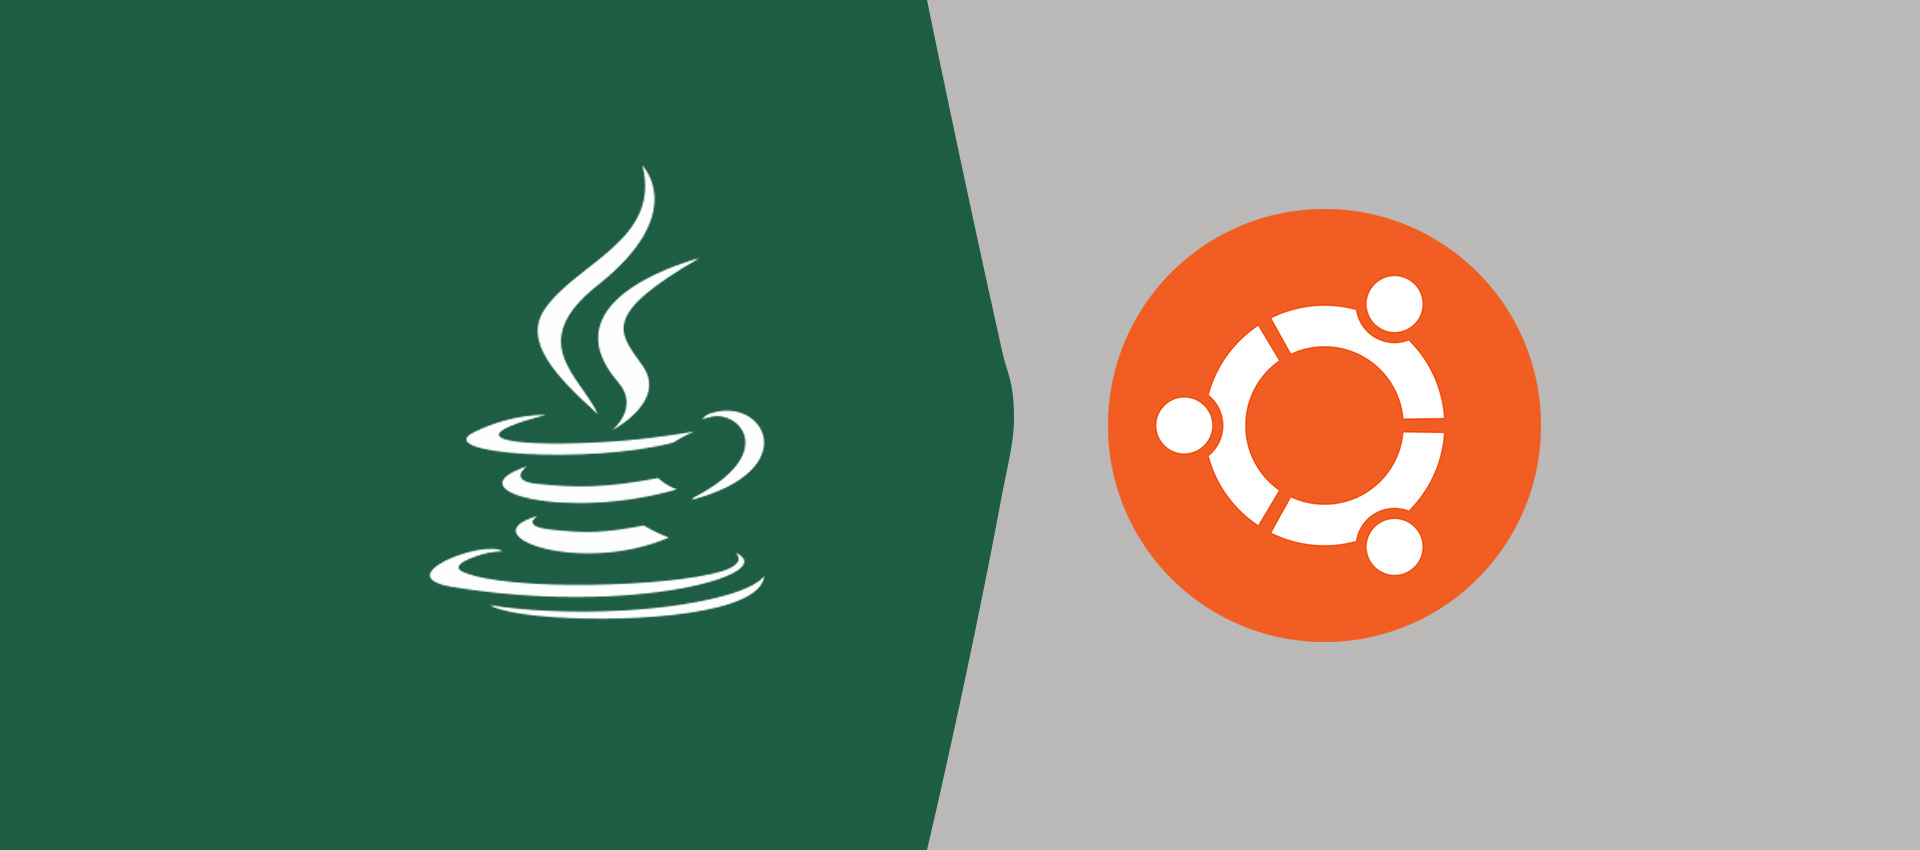 How To Install Java 14 On Ubuntu